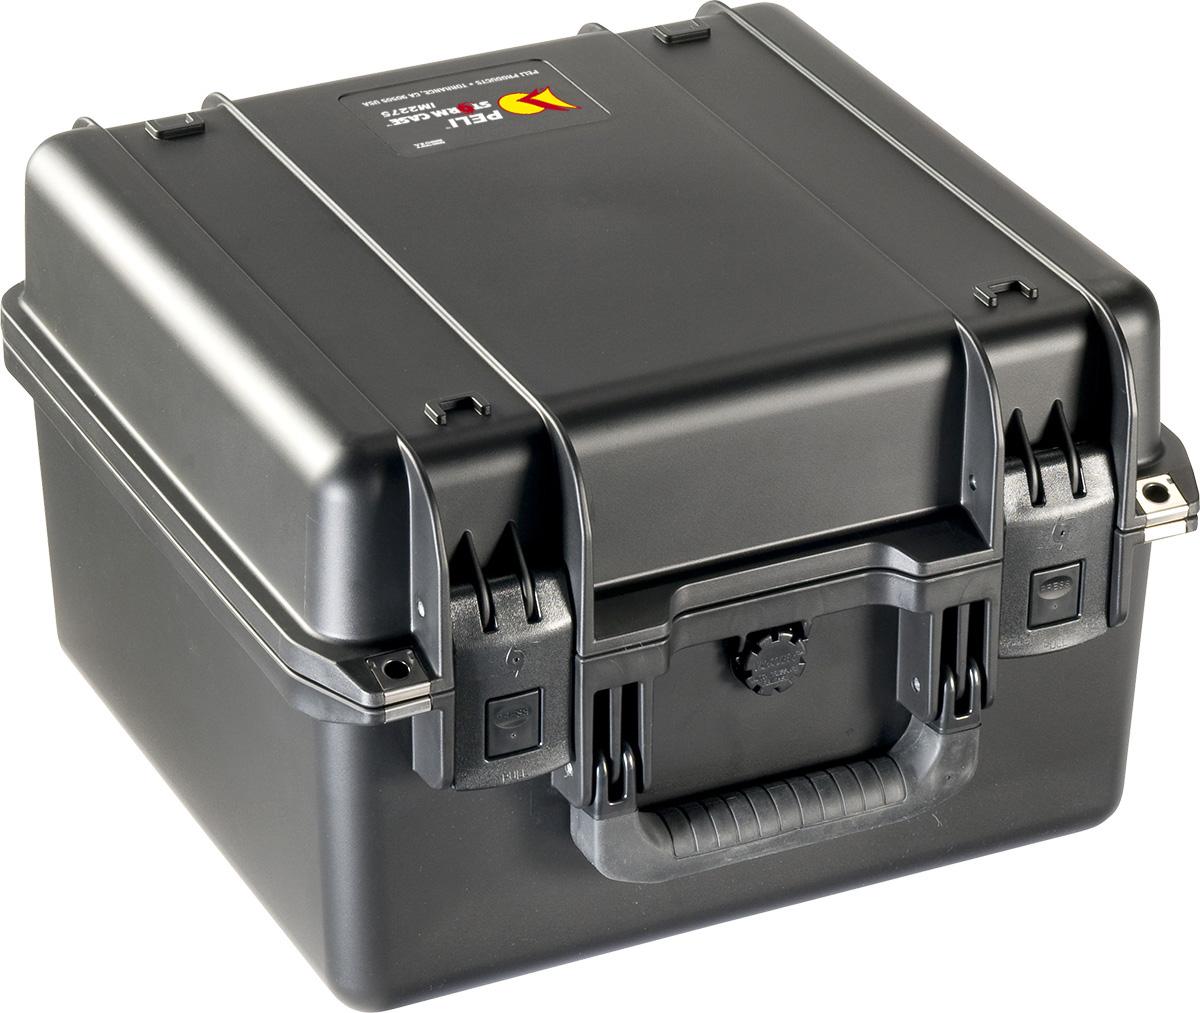 pelican im2275 storm gun cases